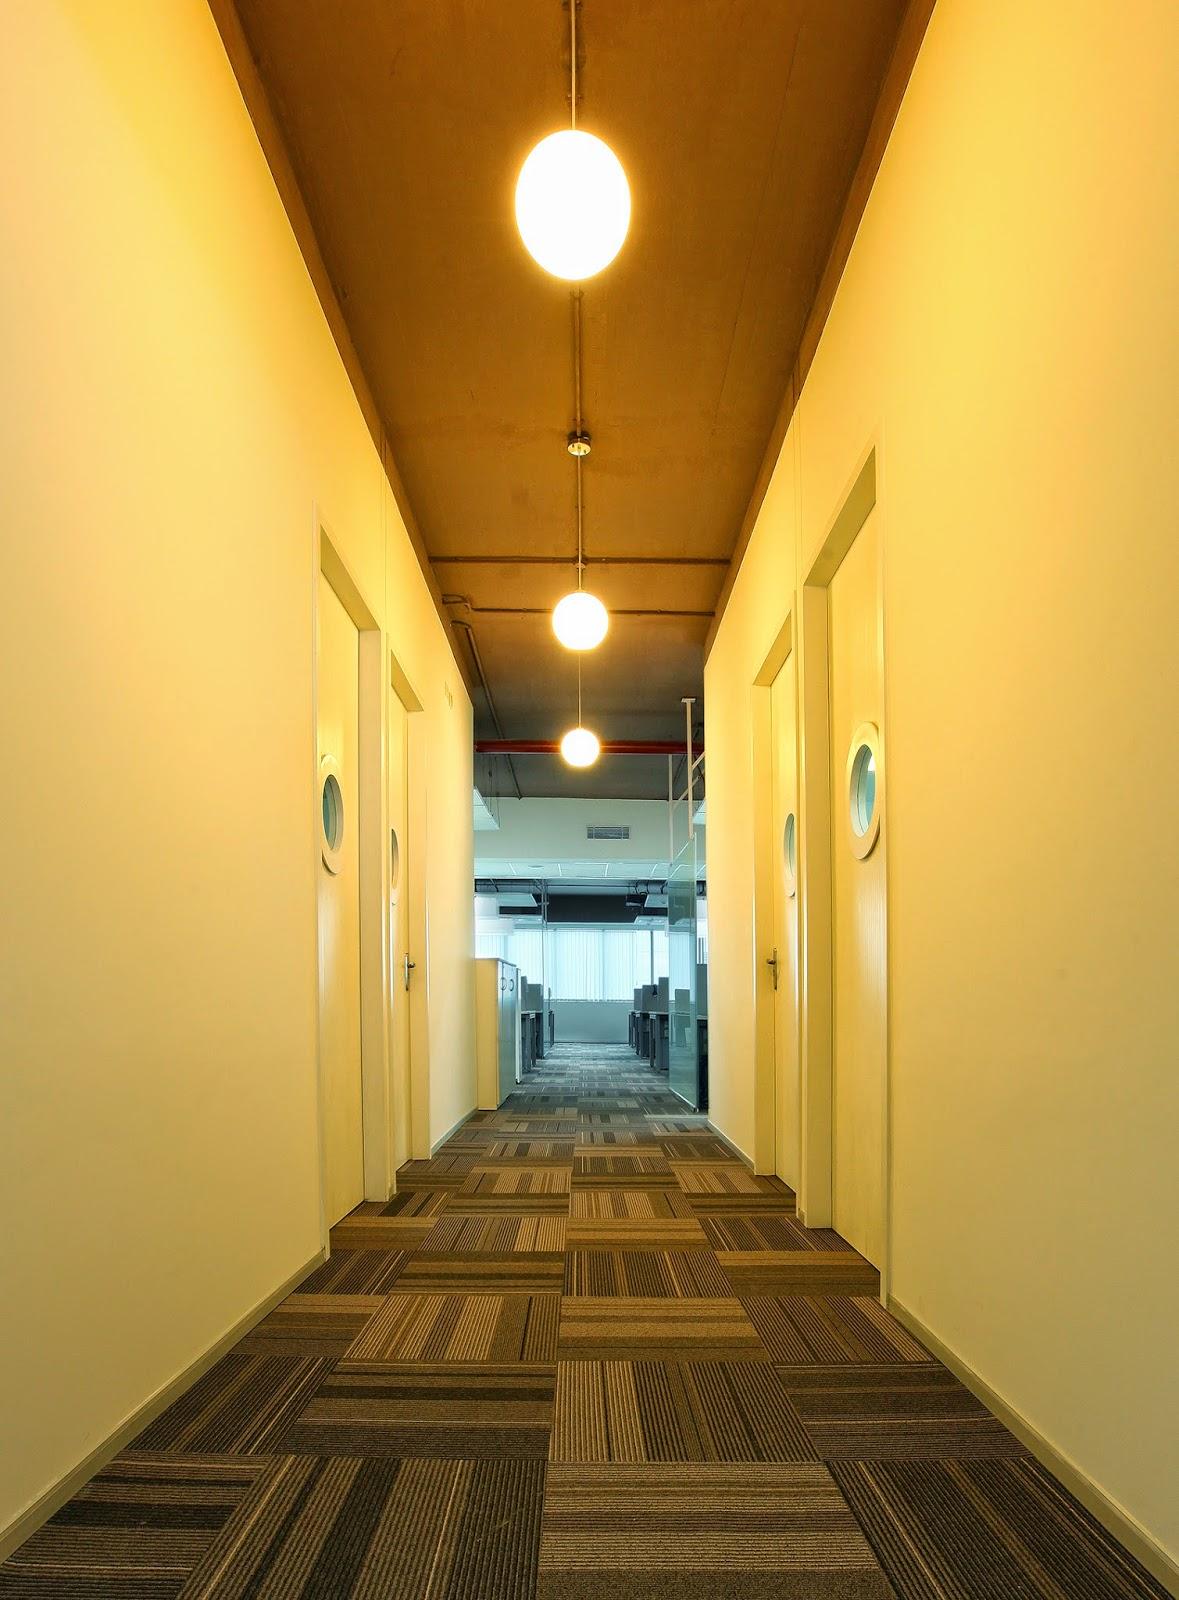 understanding symmetry in architecture